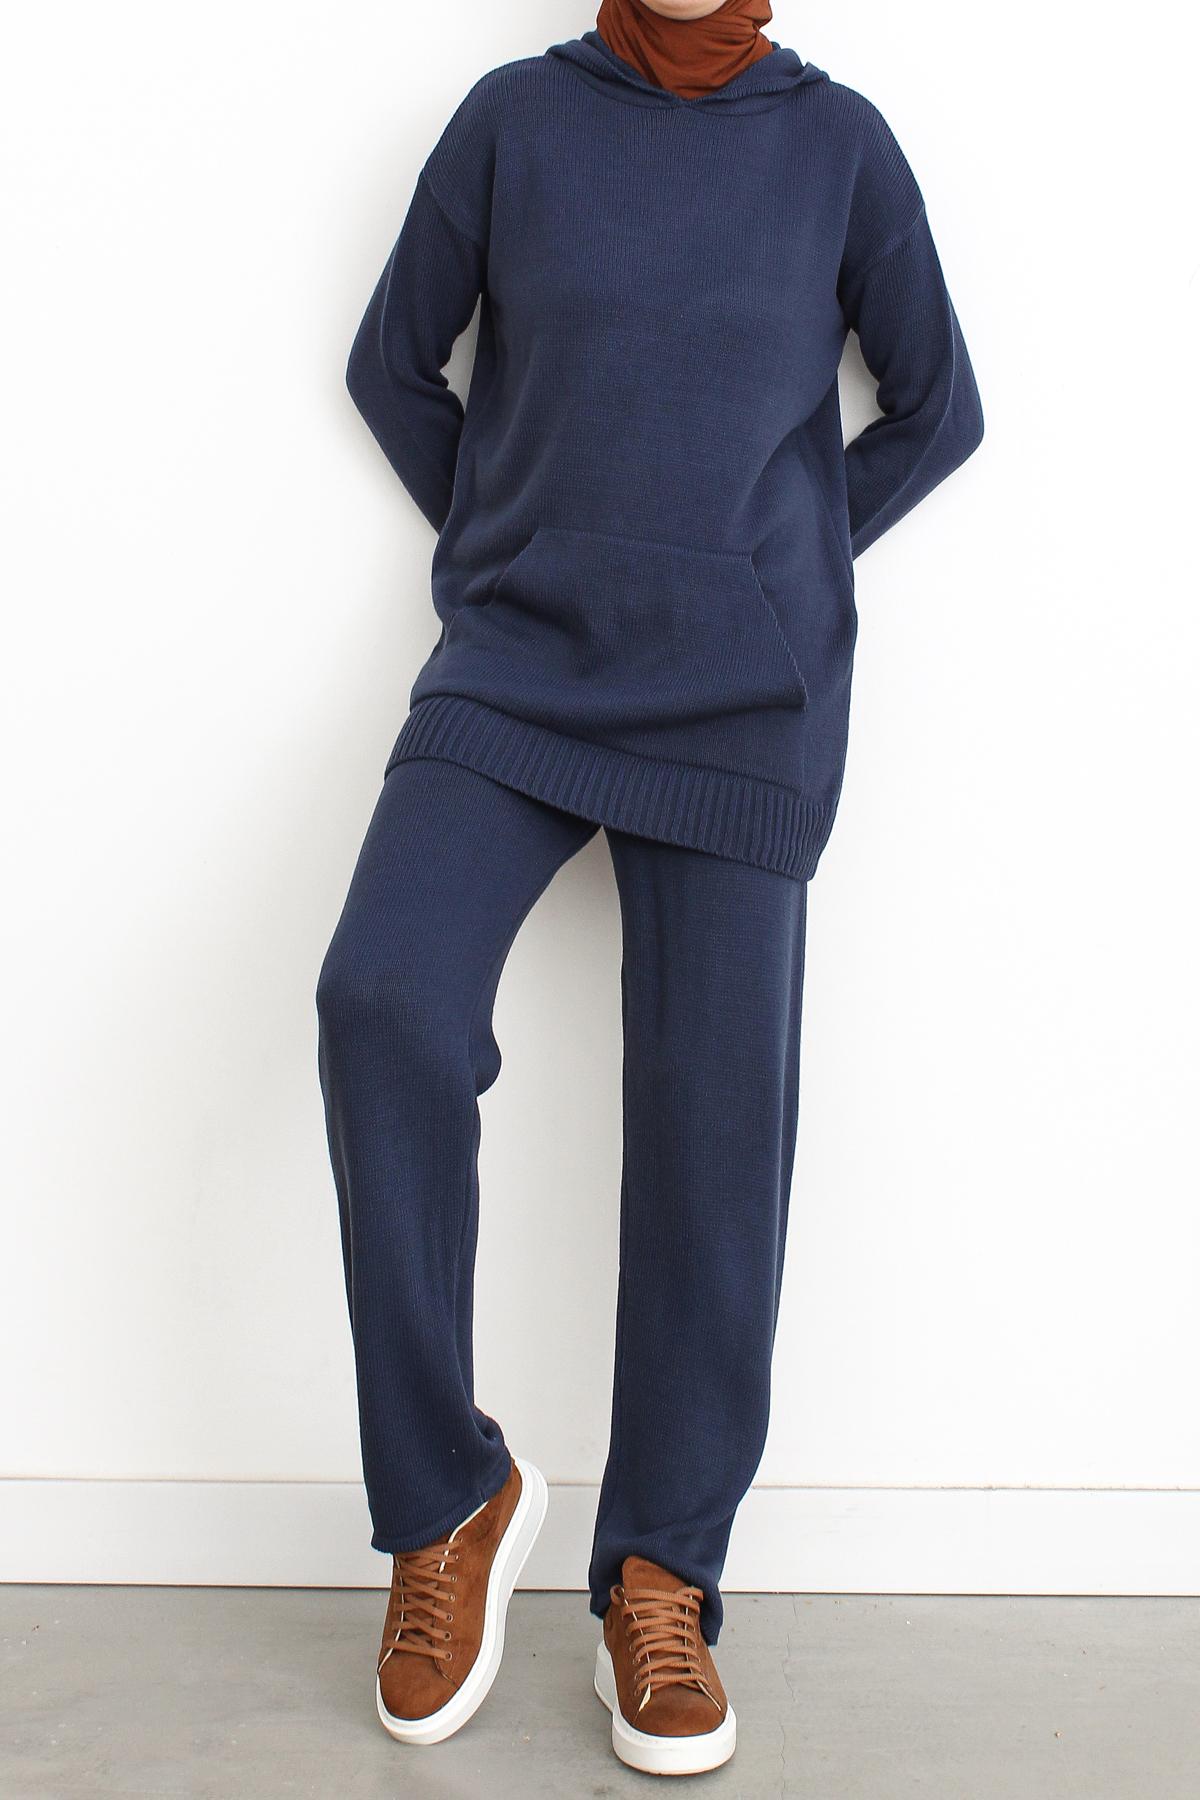 Hooded Kangaroo Pocket Blouse and Pants Set